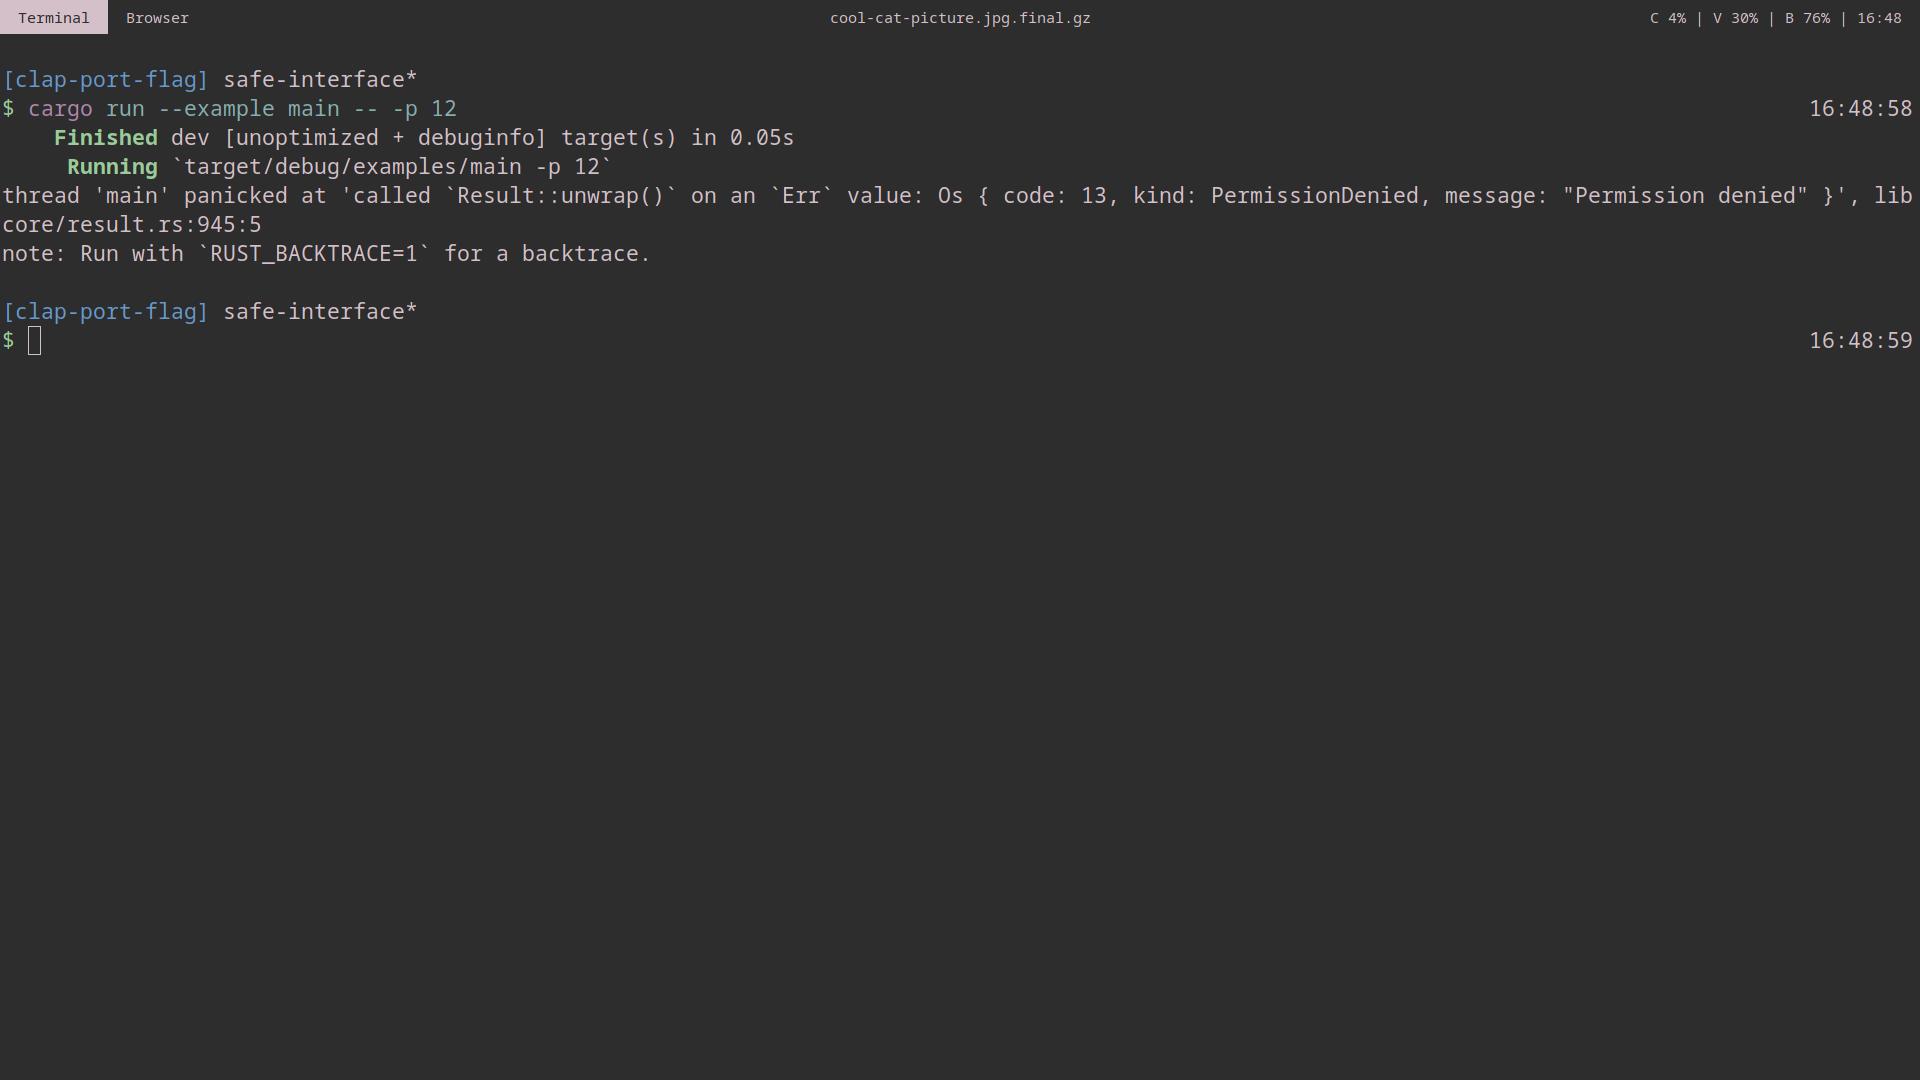 Improve error handling on bad port · Issue #5 · rust-cli